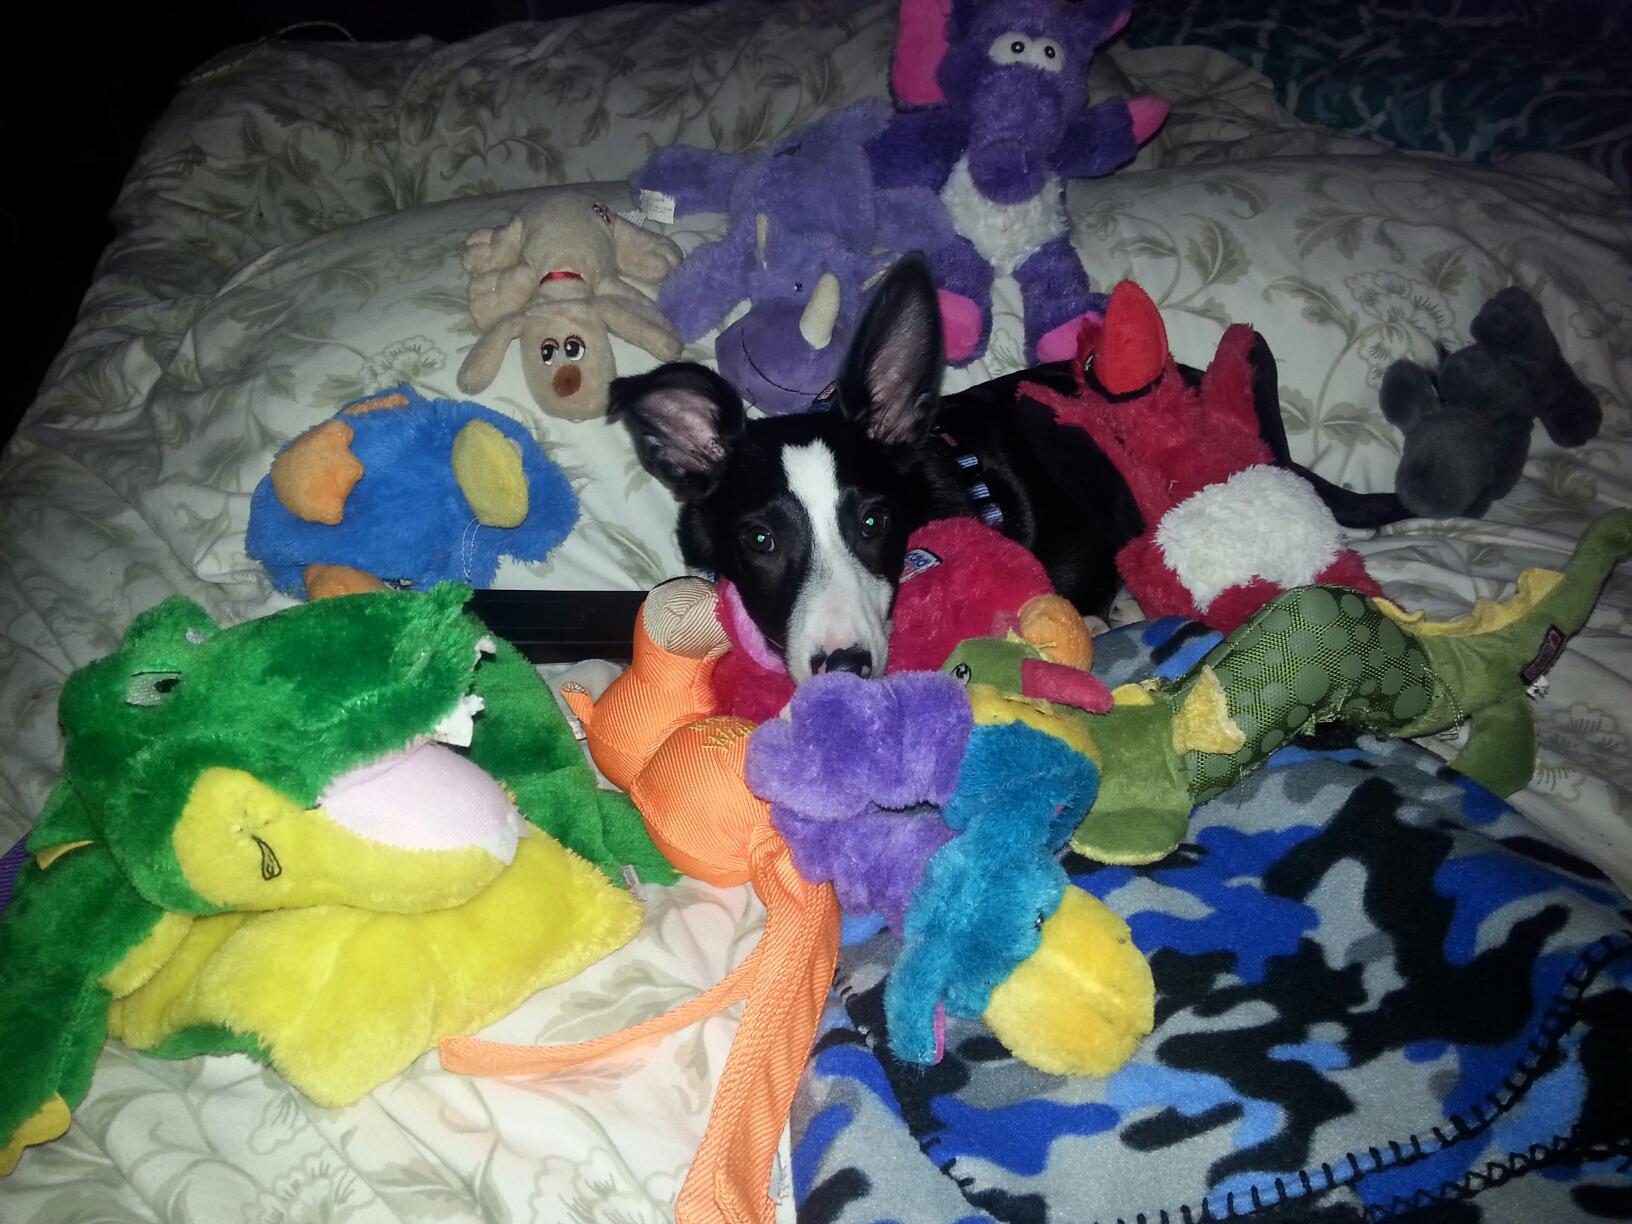 liam-lapierre--4-month-old-border-collie-puppy